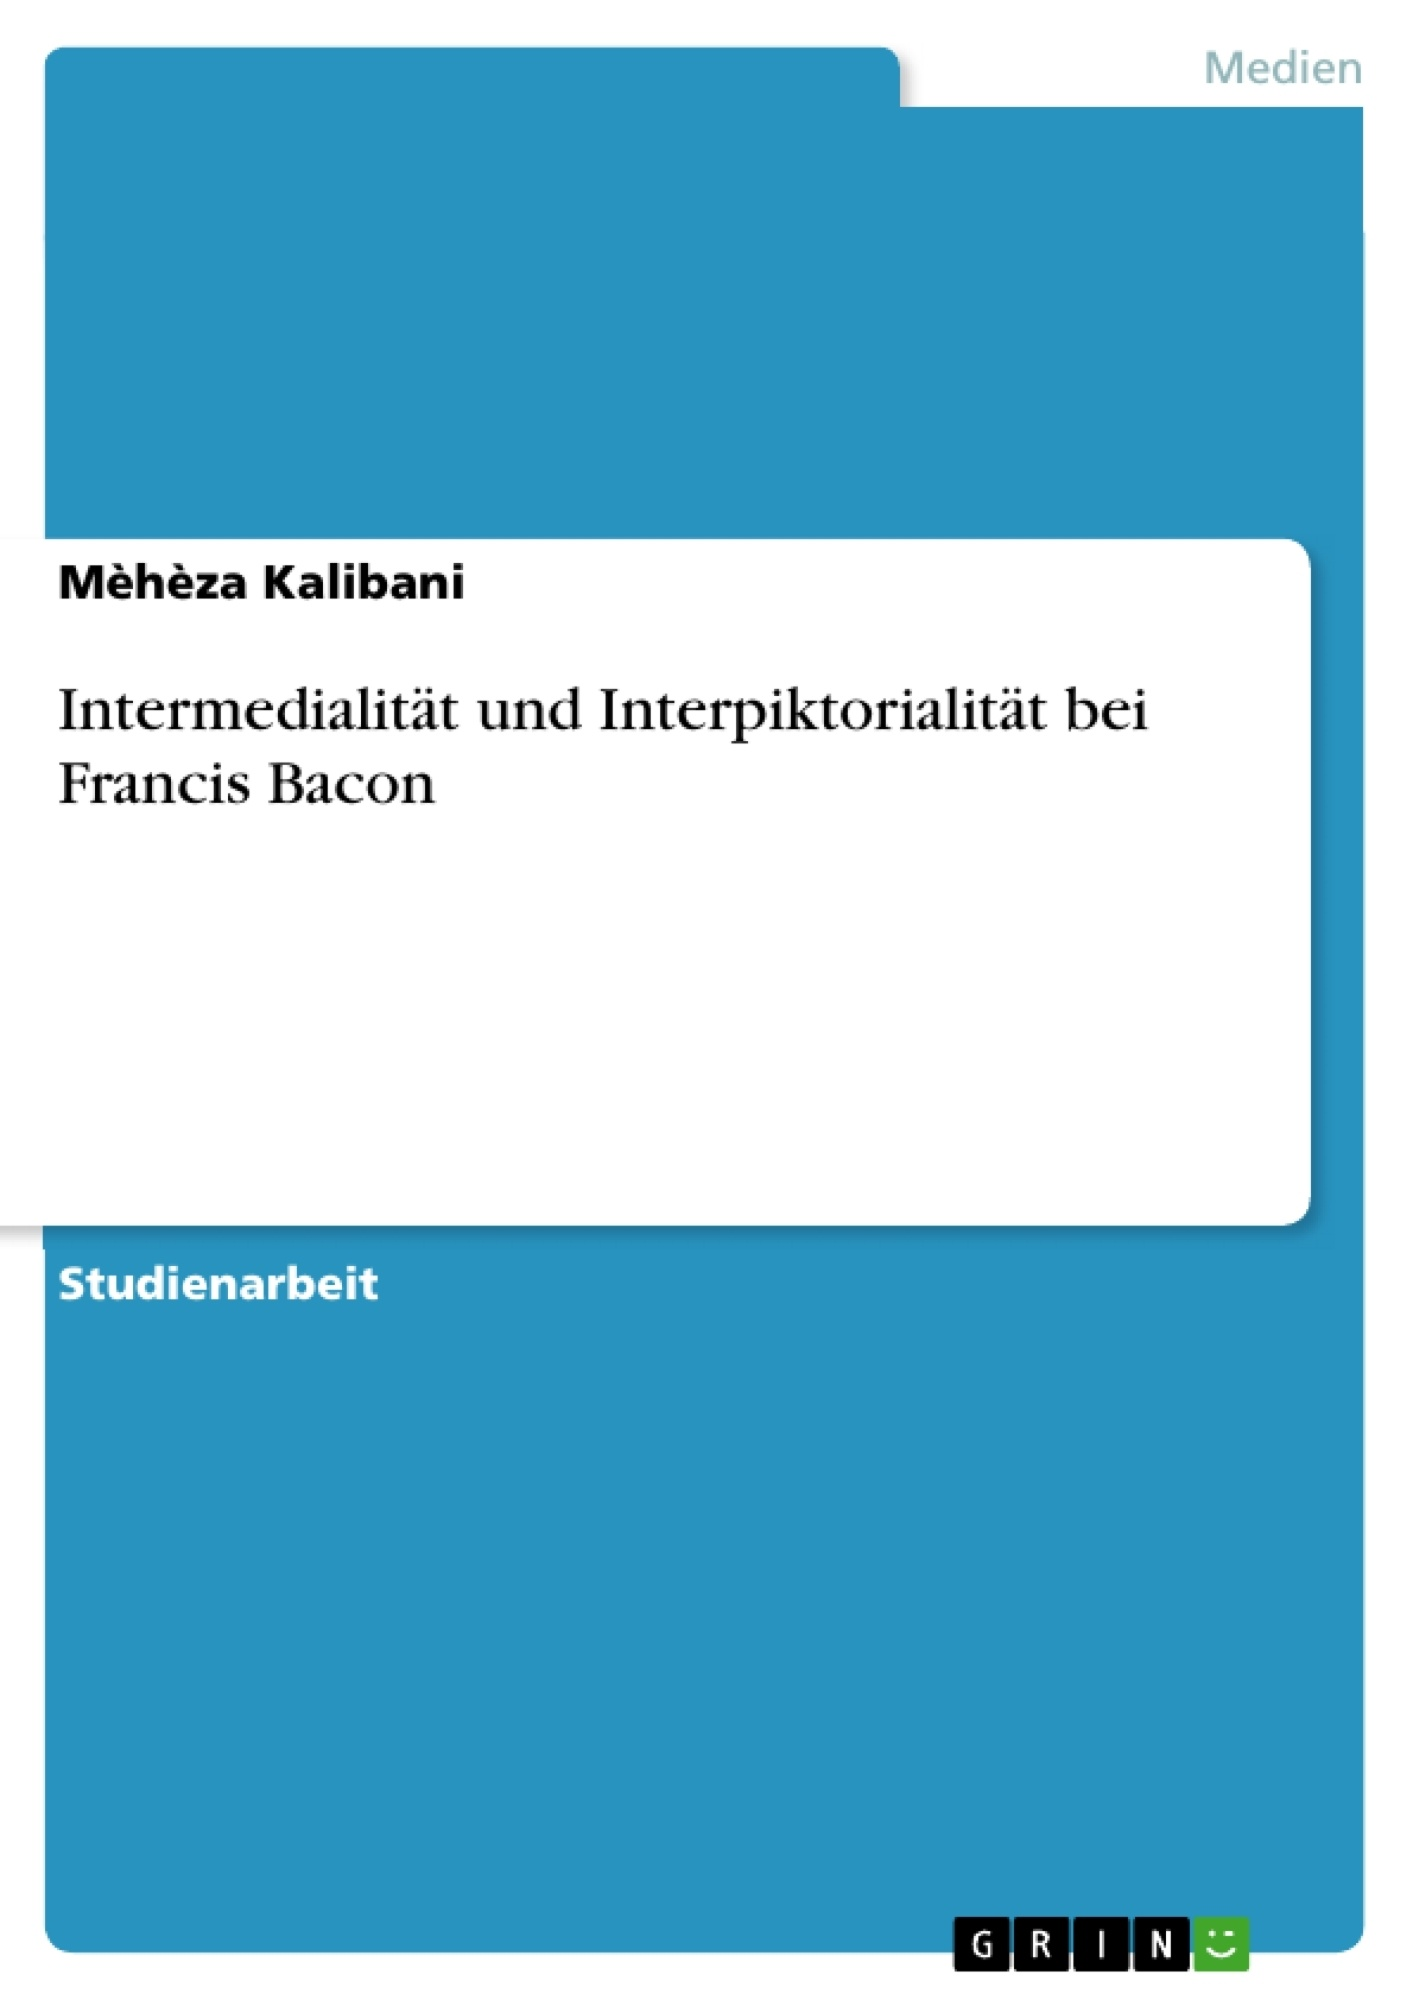 Titel: Intermedialität und Interpiktorialität bei Francis Bacon